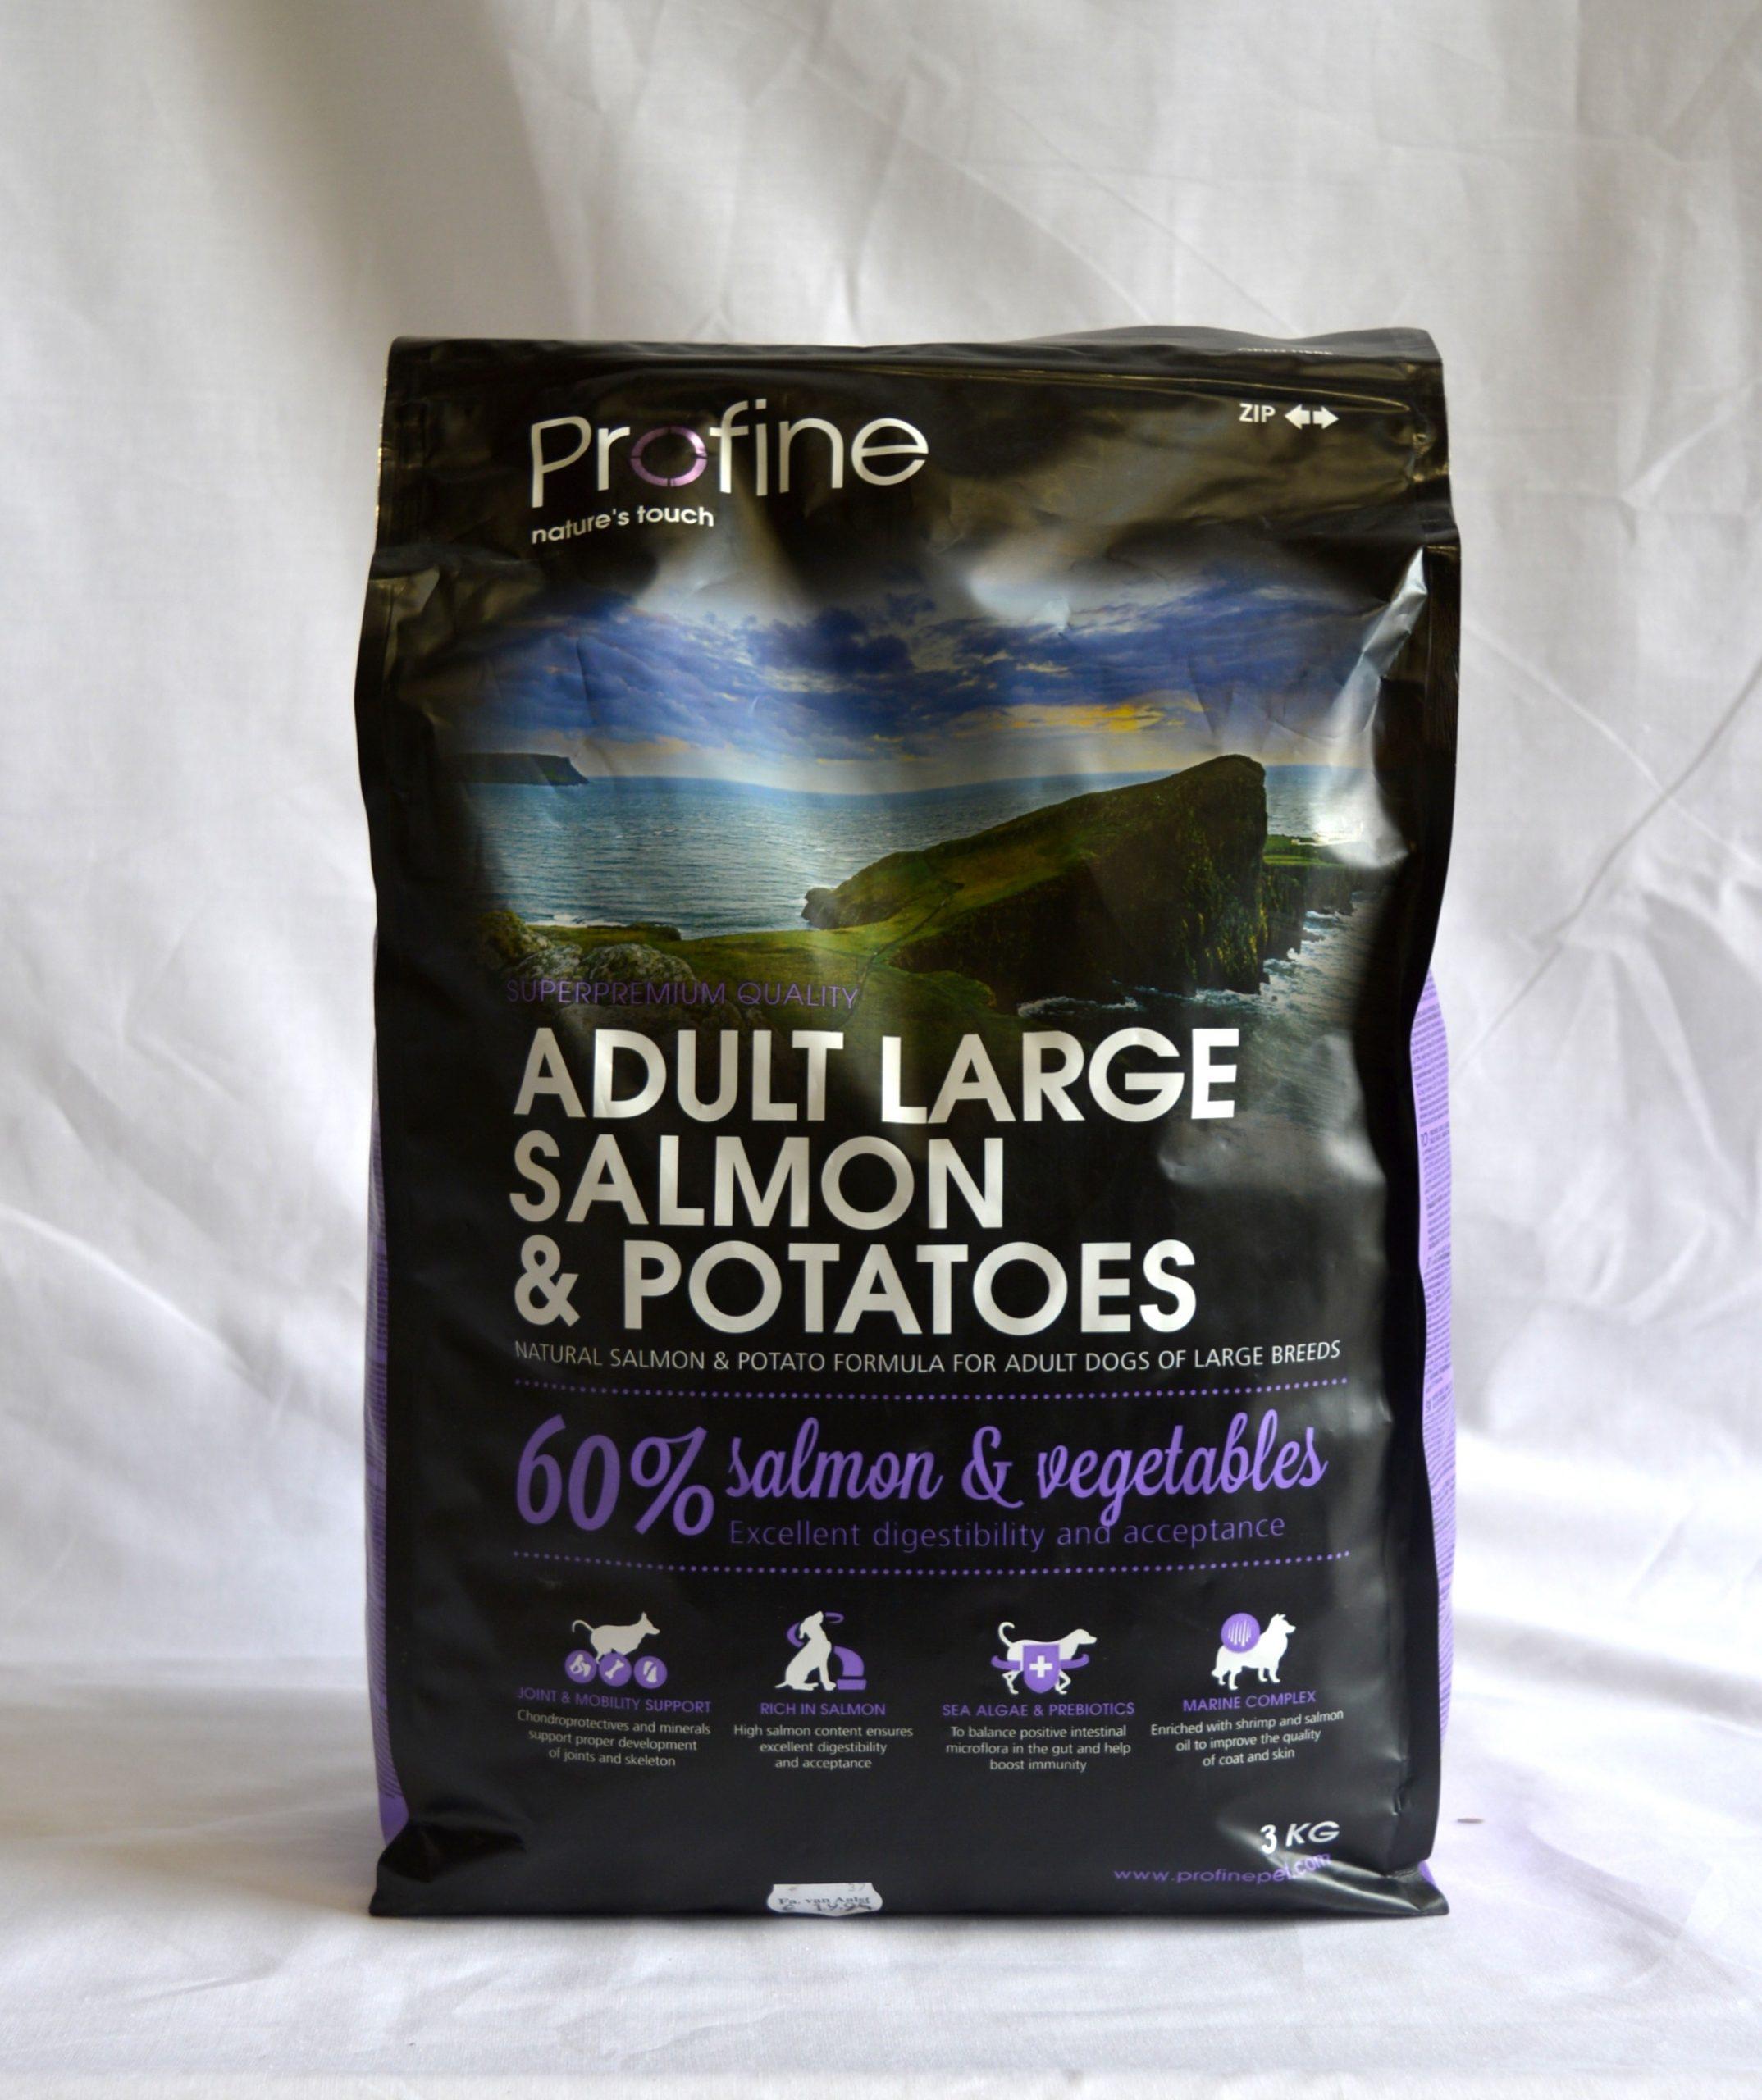 Profine Salmon & Potatoes Adult Large-3kg